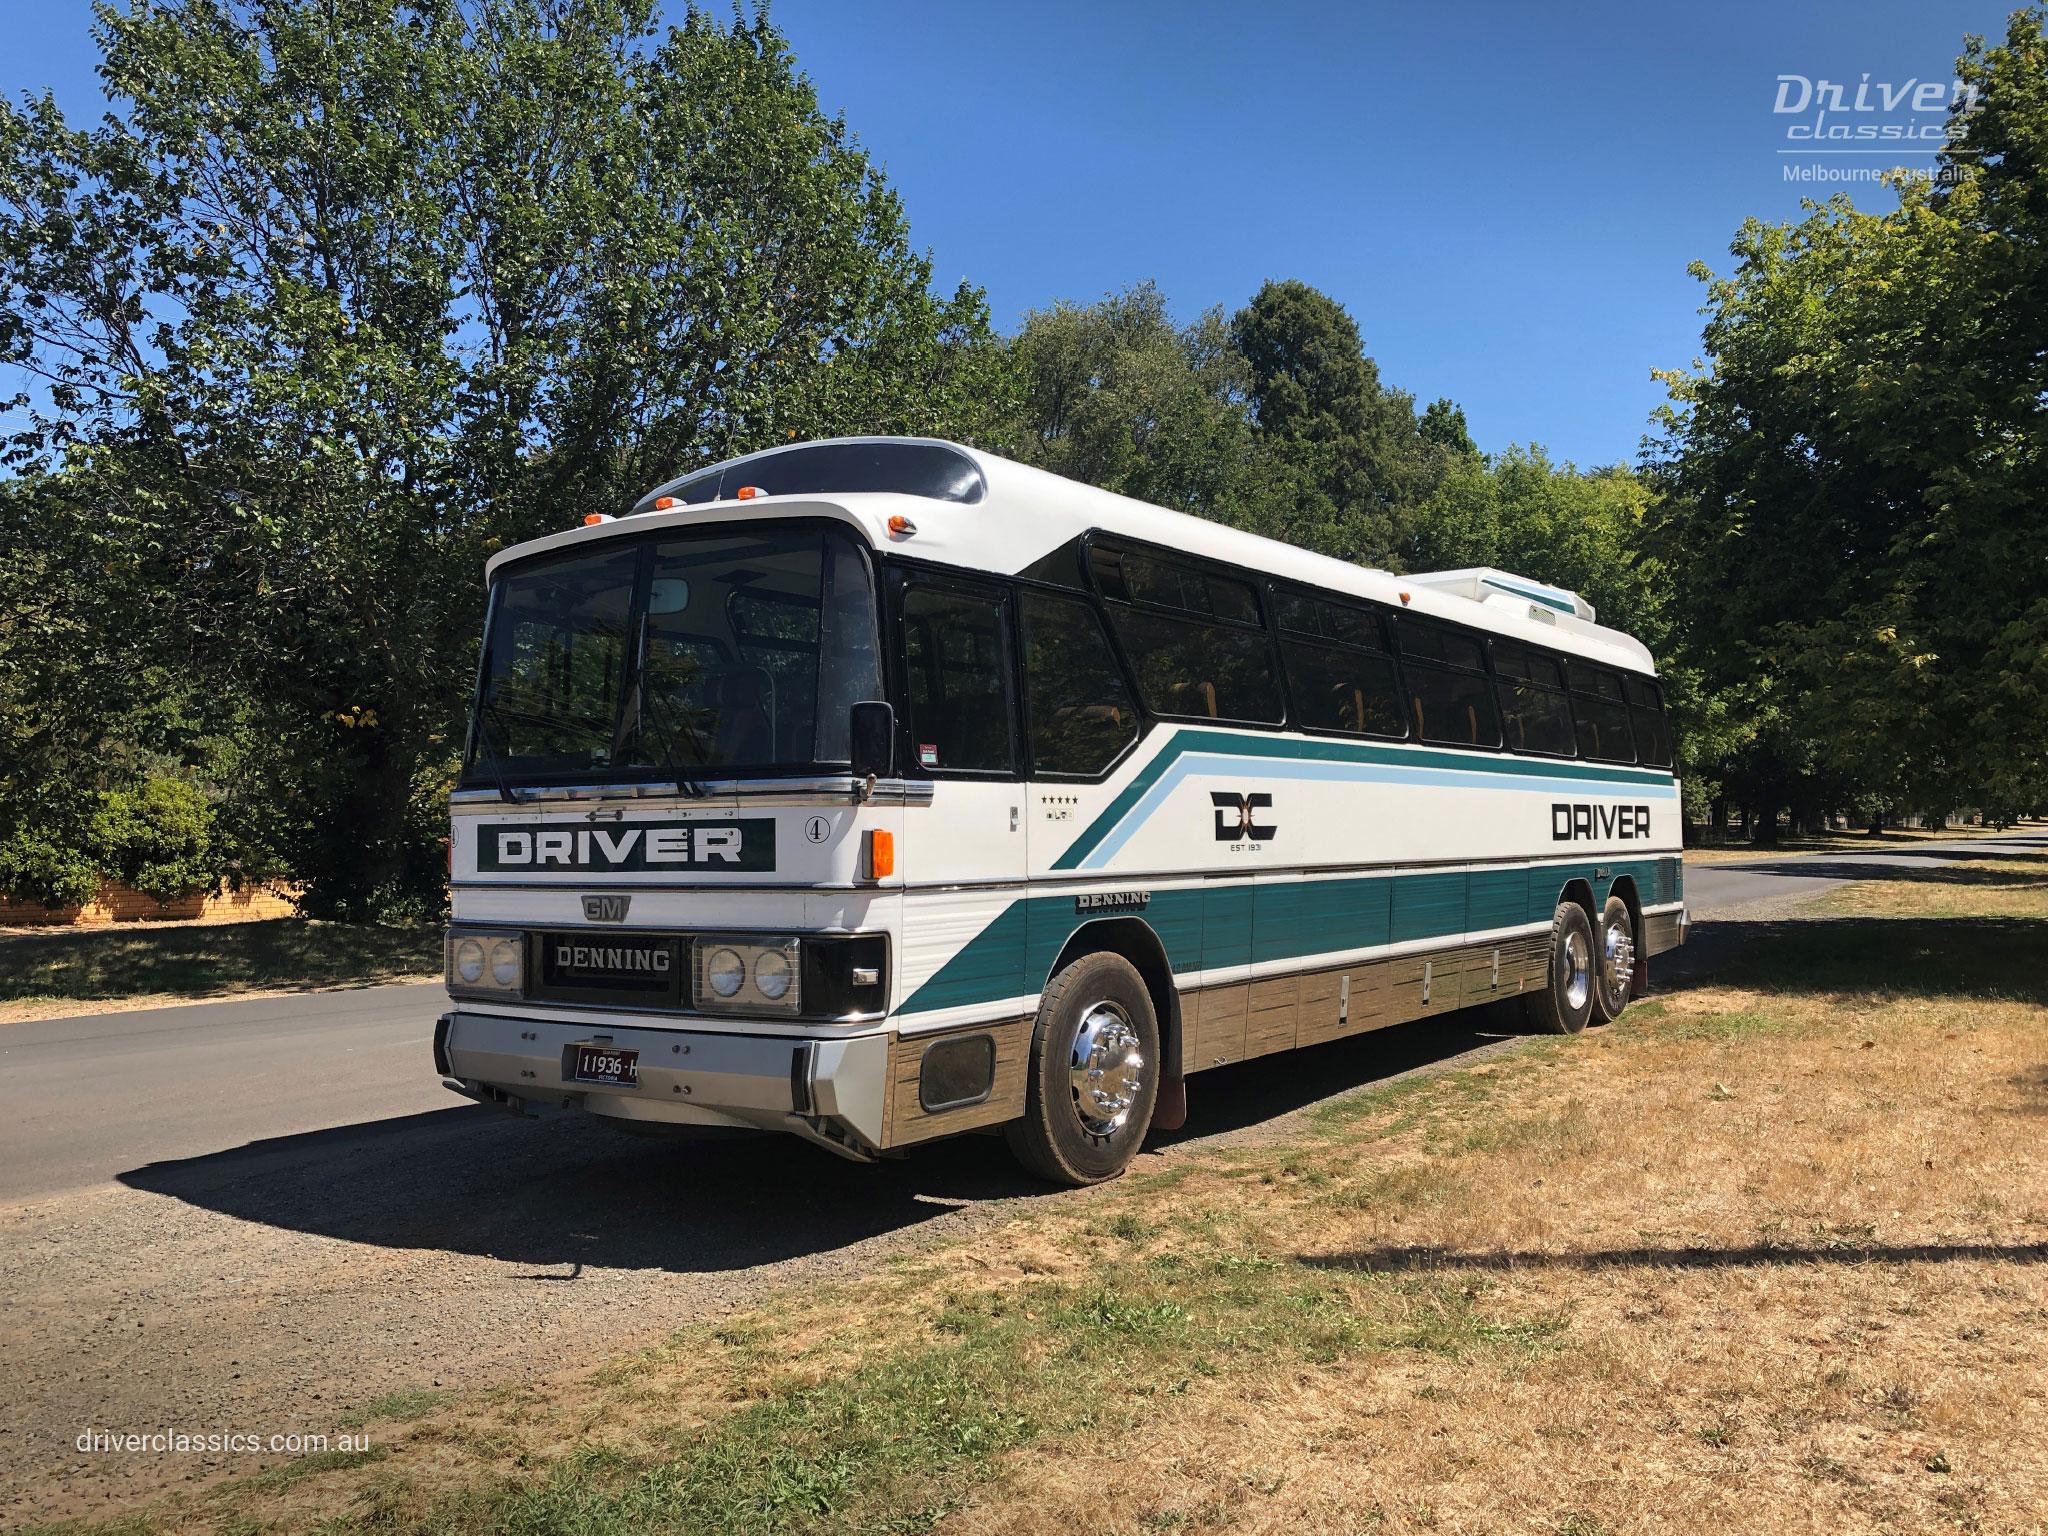 GM Denning DenAir Mono Bus, 1983 model, Lancefield VIC, Photo taken February 2019